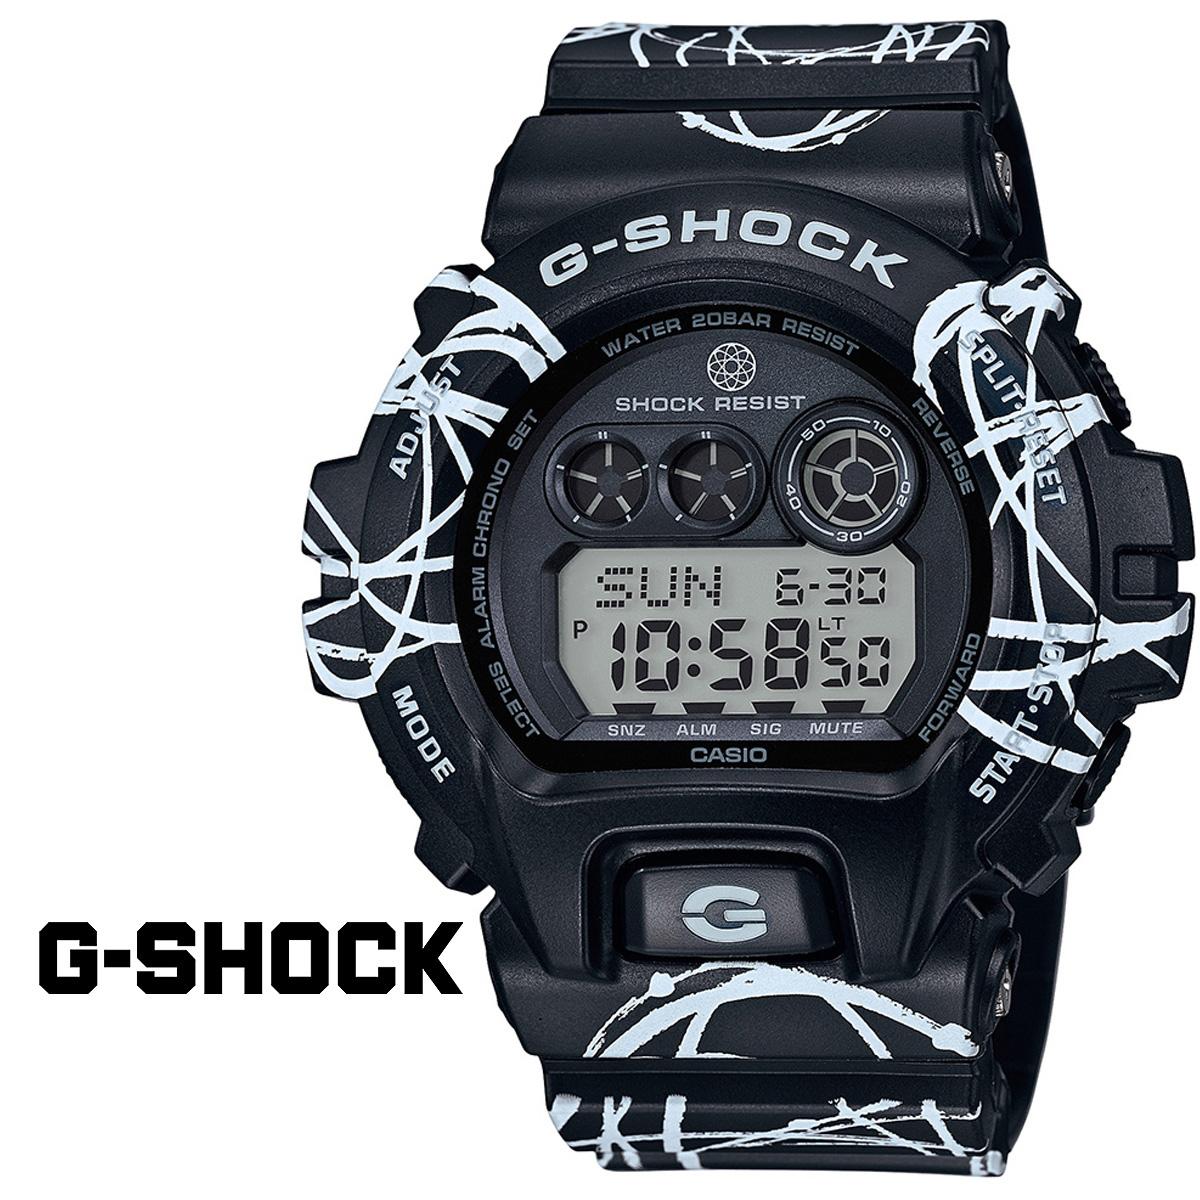 CASIO Casio g-shock watch collaboration FUTURA GD-X6900FTR-1JR